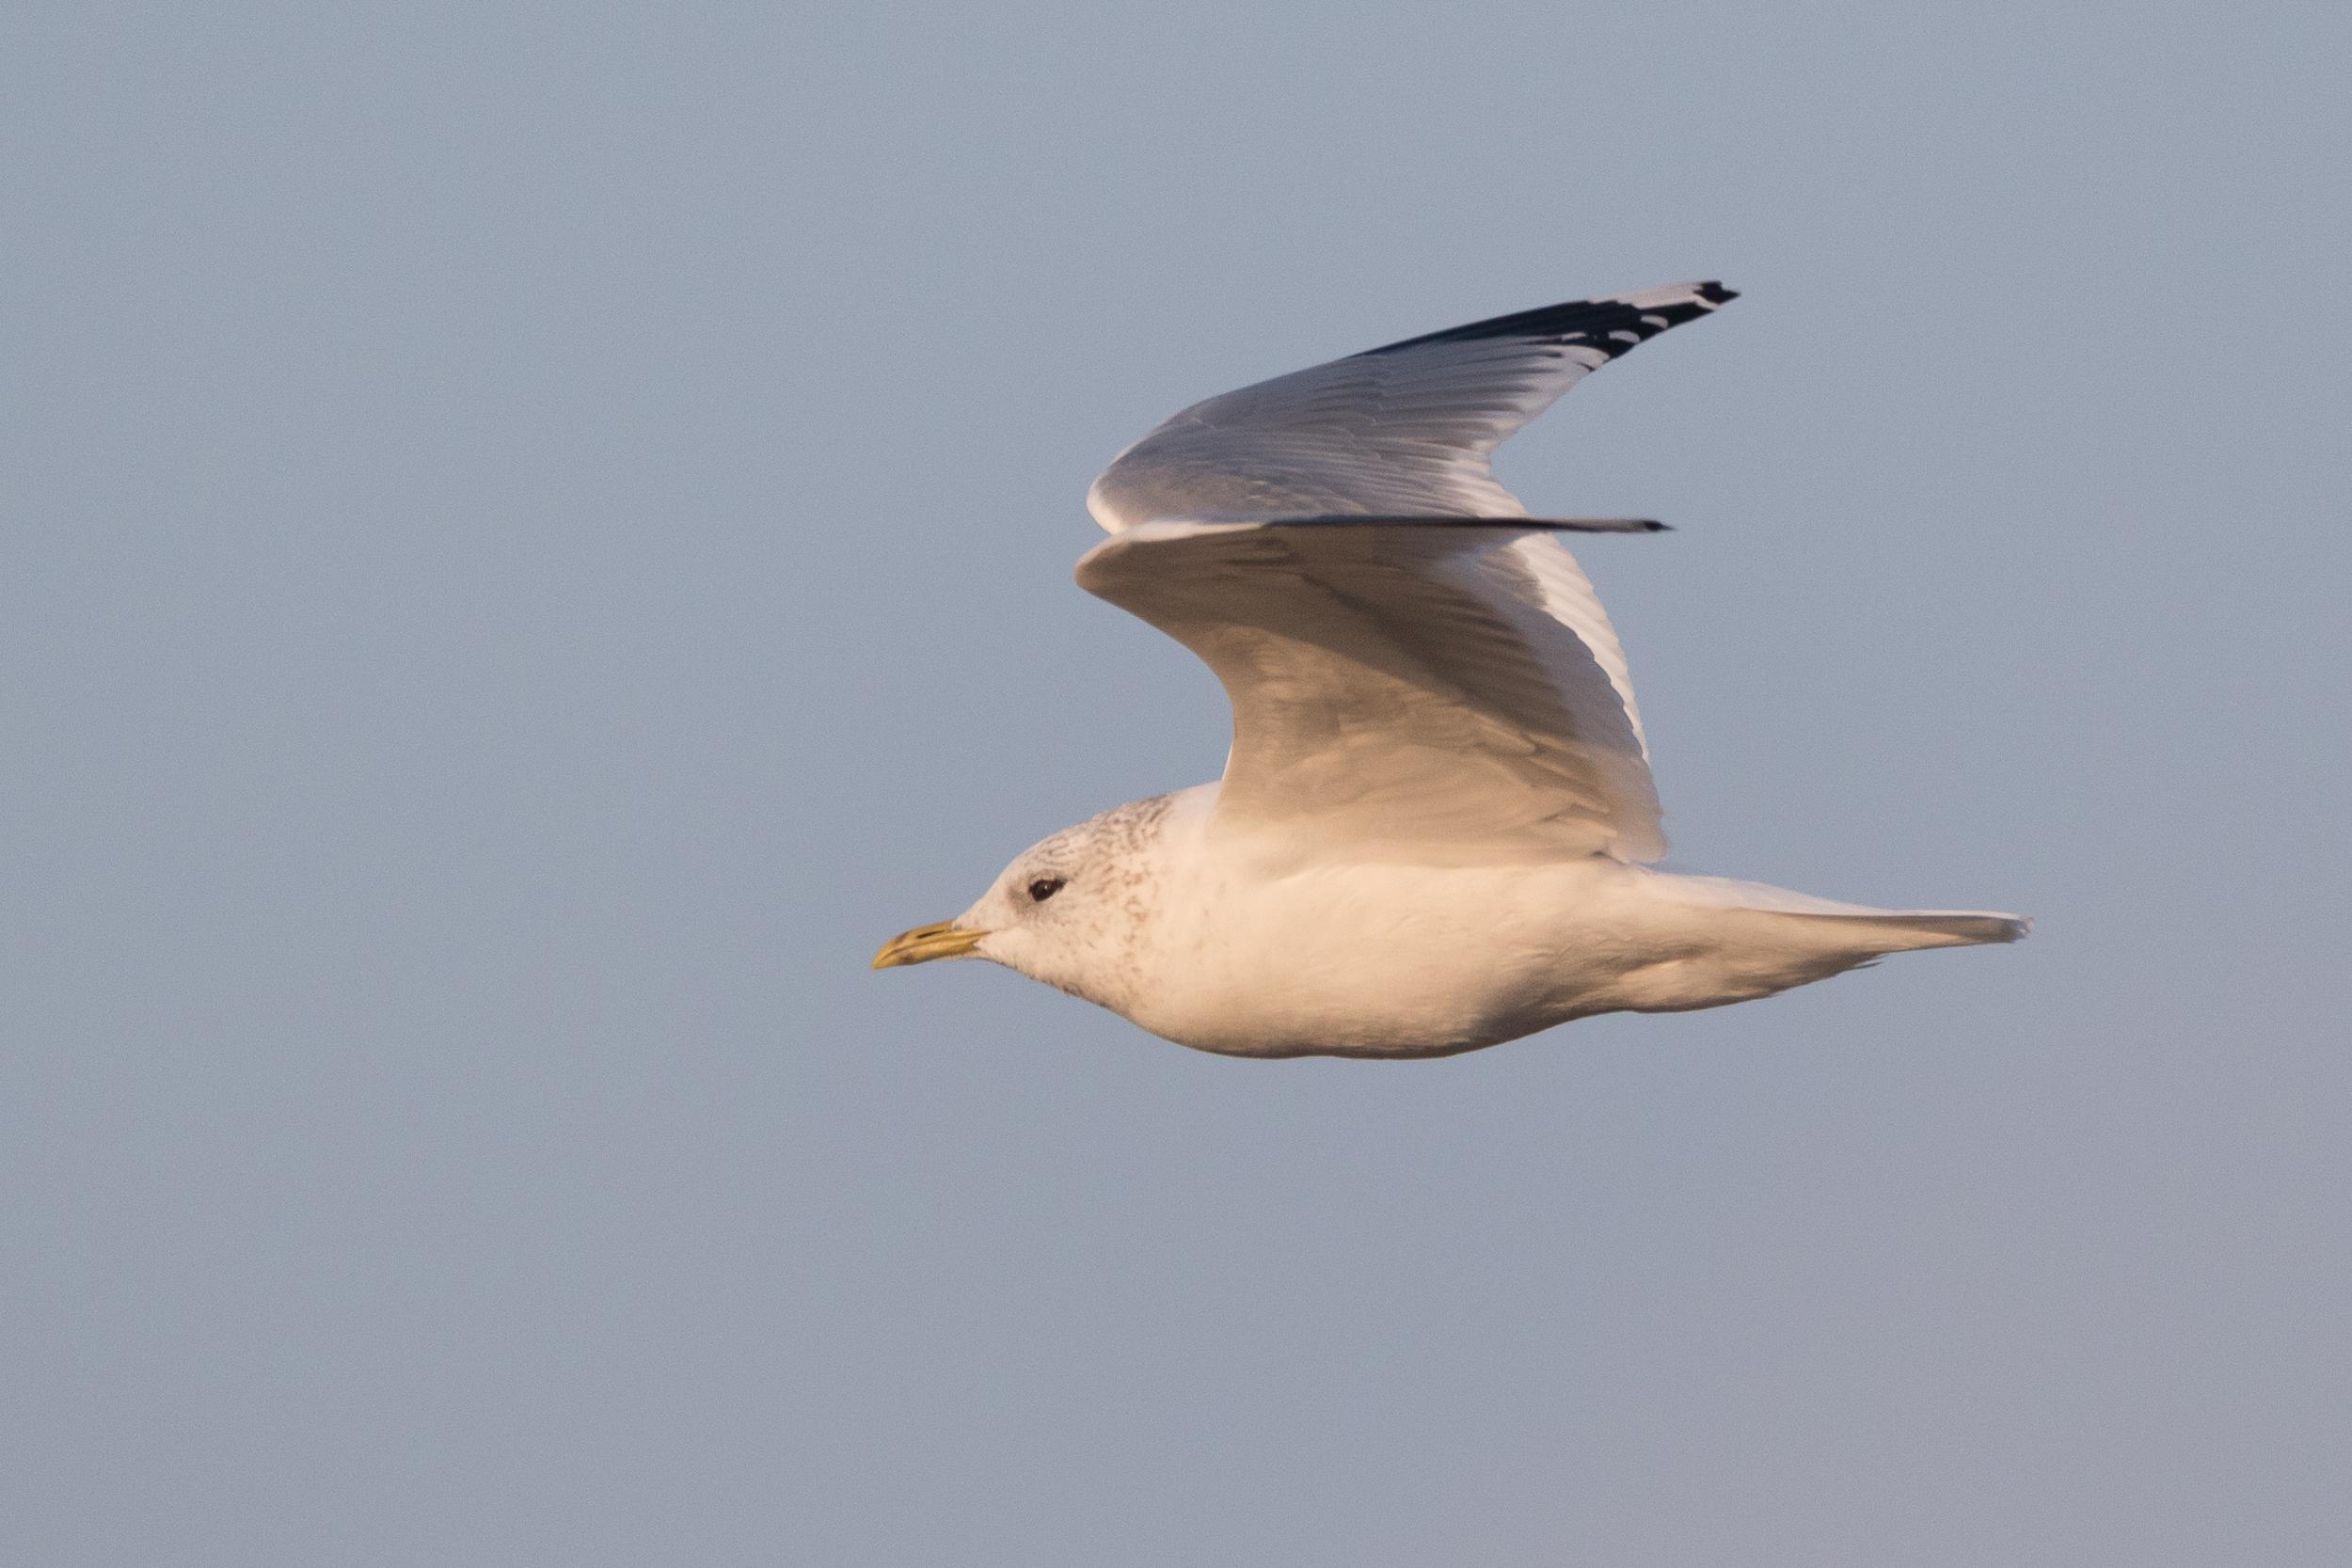 20170126-Common Gull Adult-140.jpg